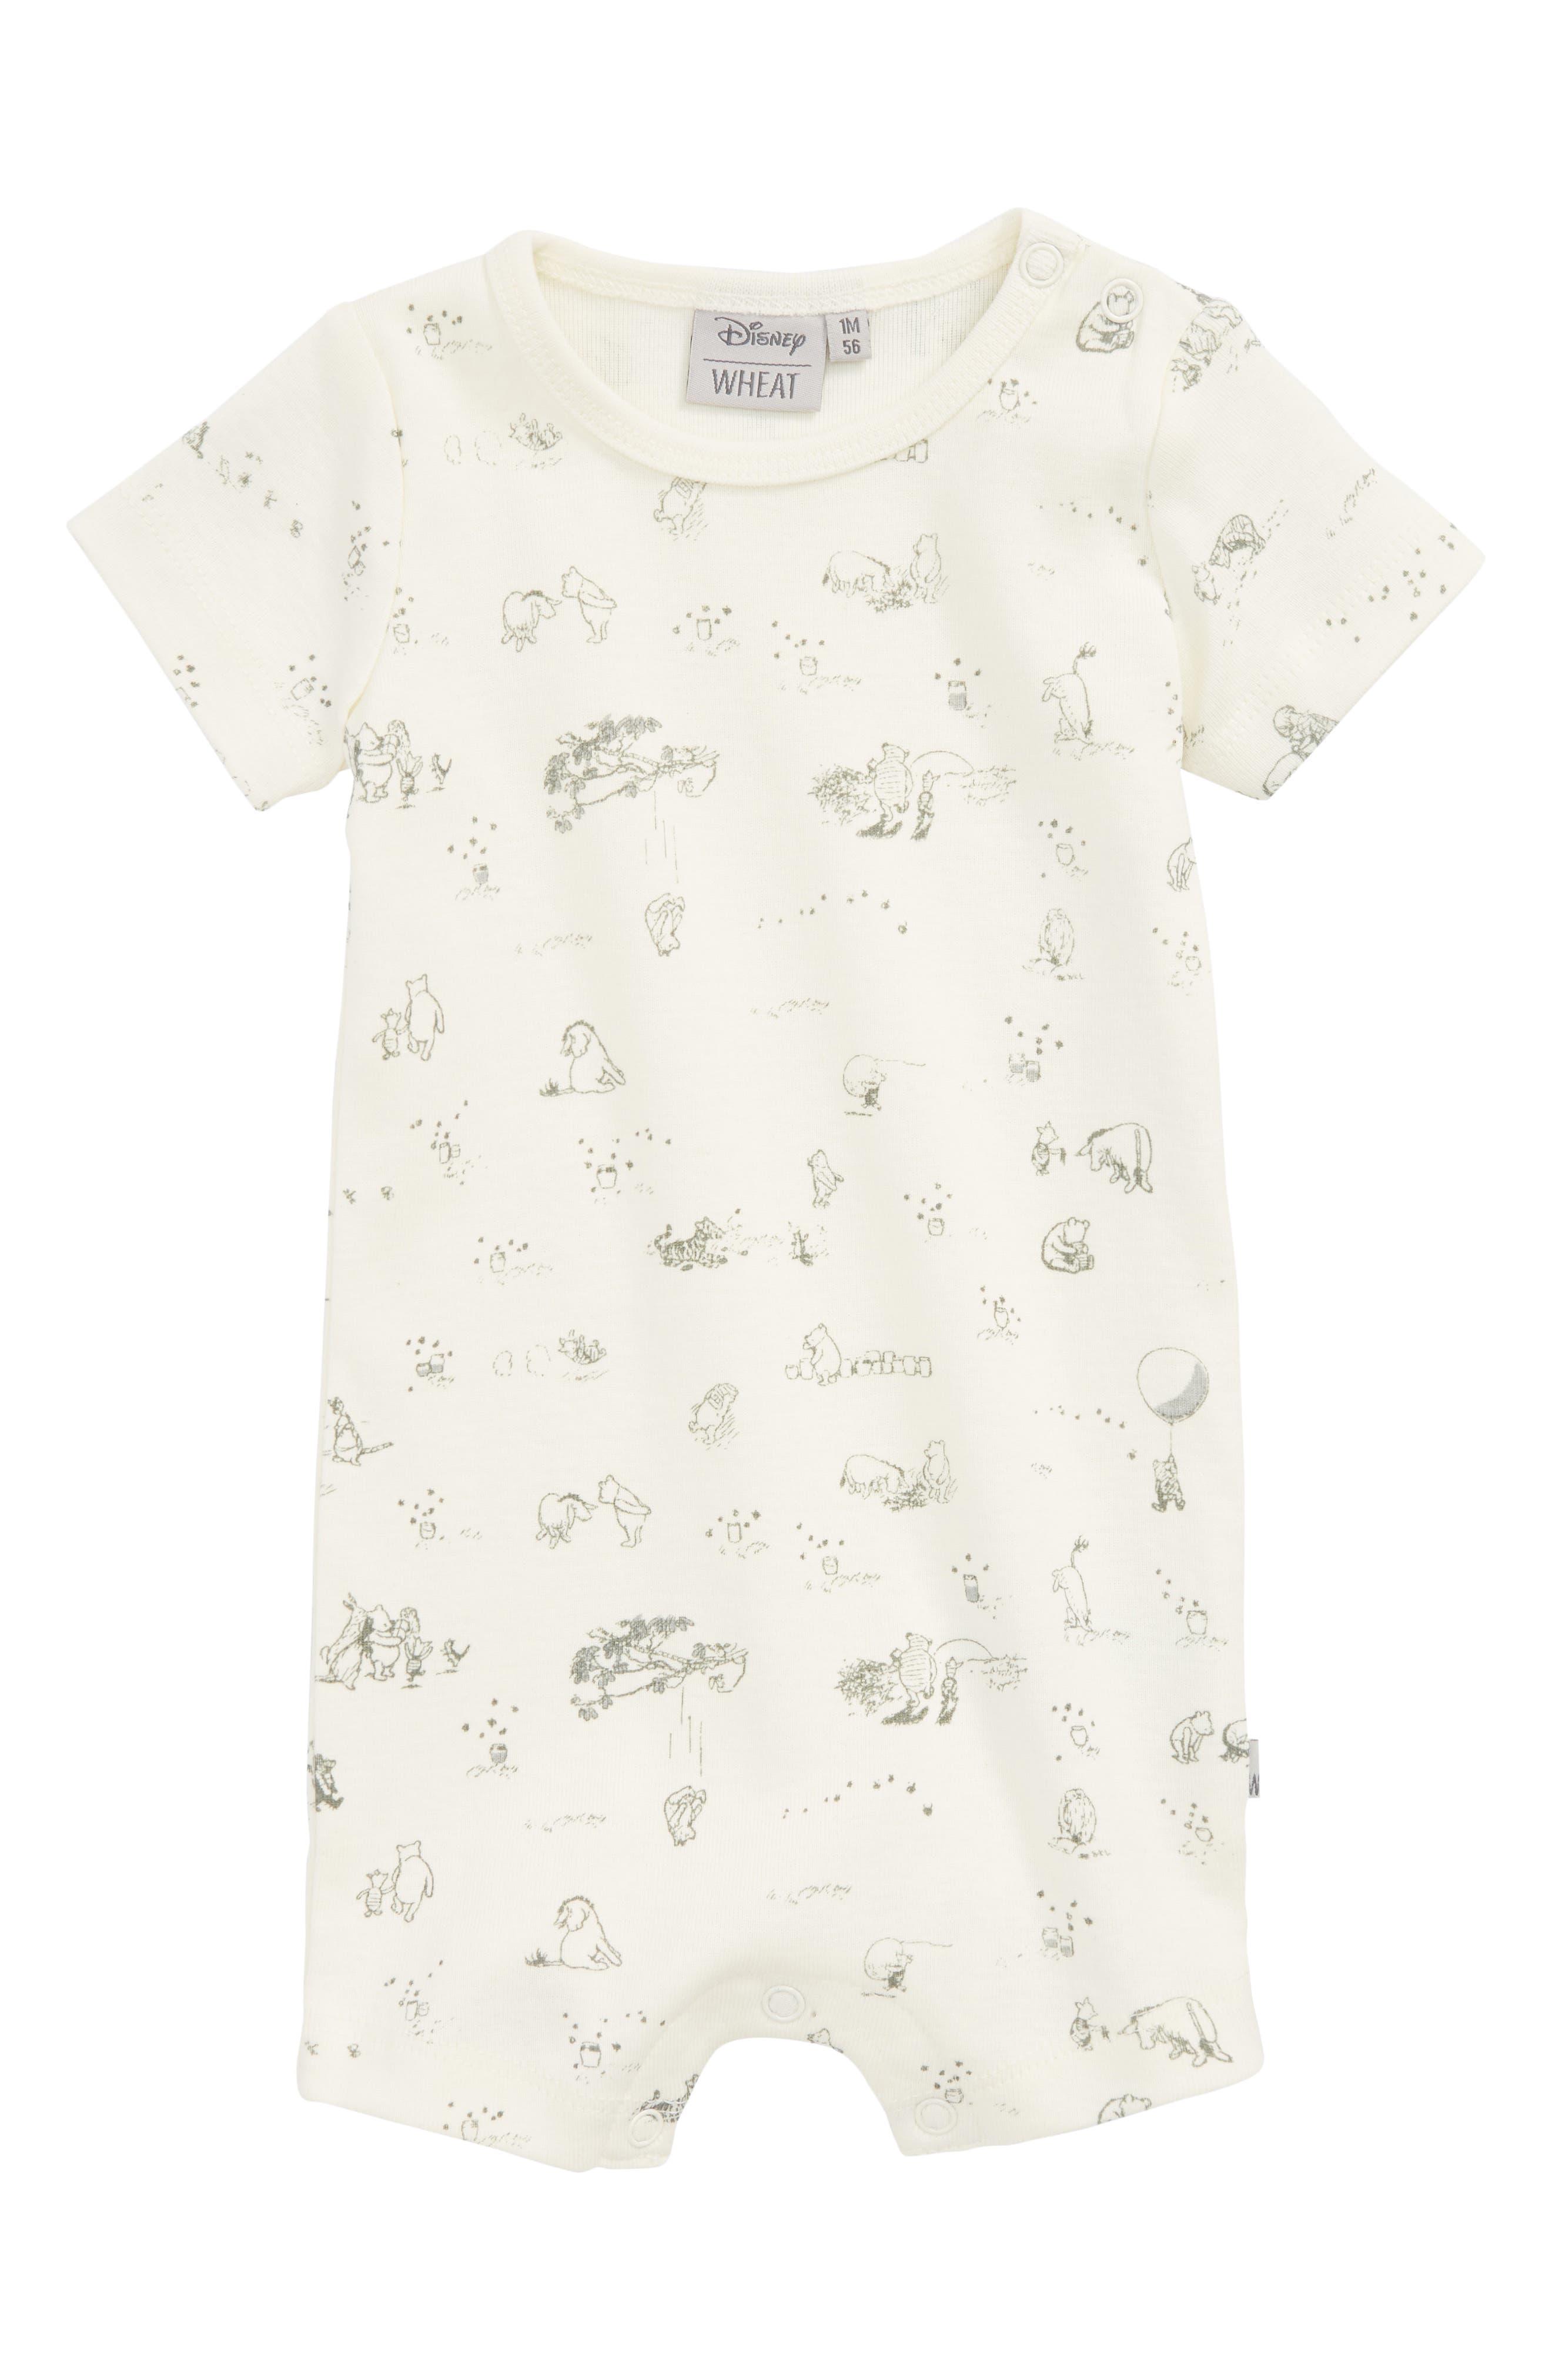 Wheat x Disney® Winnie the Pooh Organic Cotton Romper (Baby)